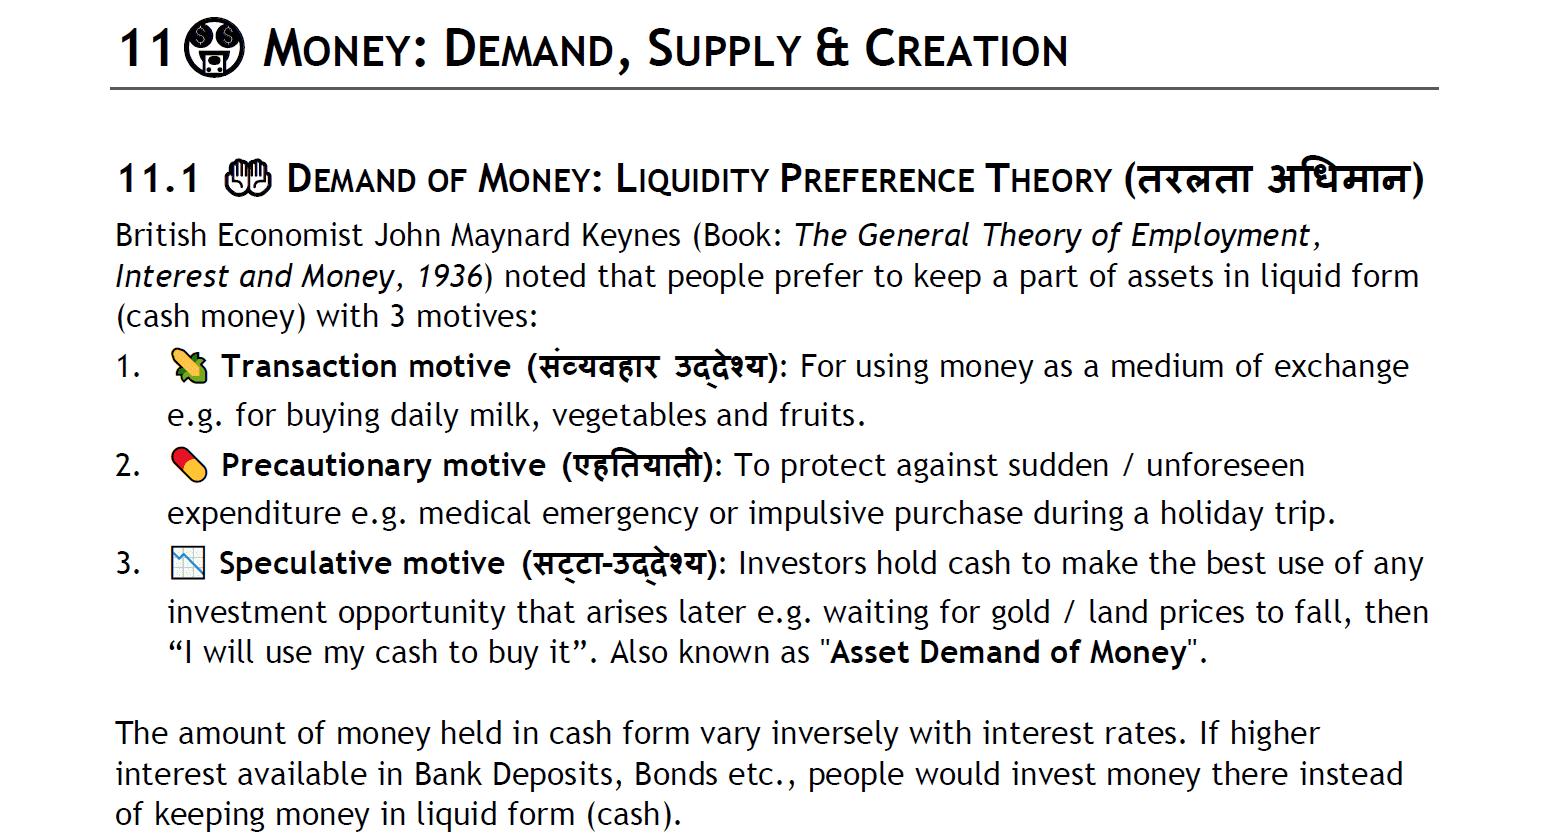 Mrunal Economy Handout complied 1 to 7